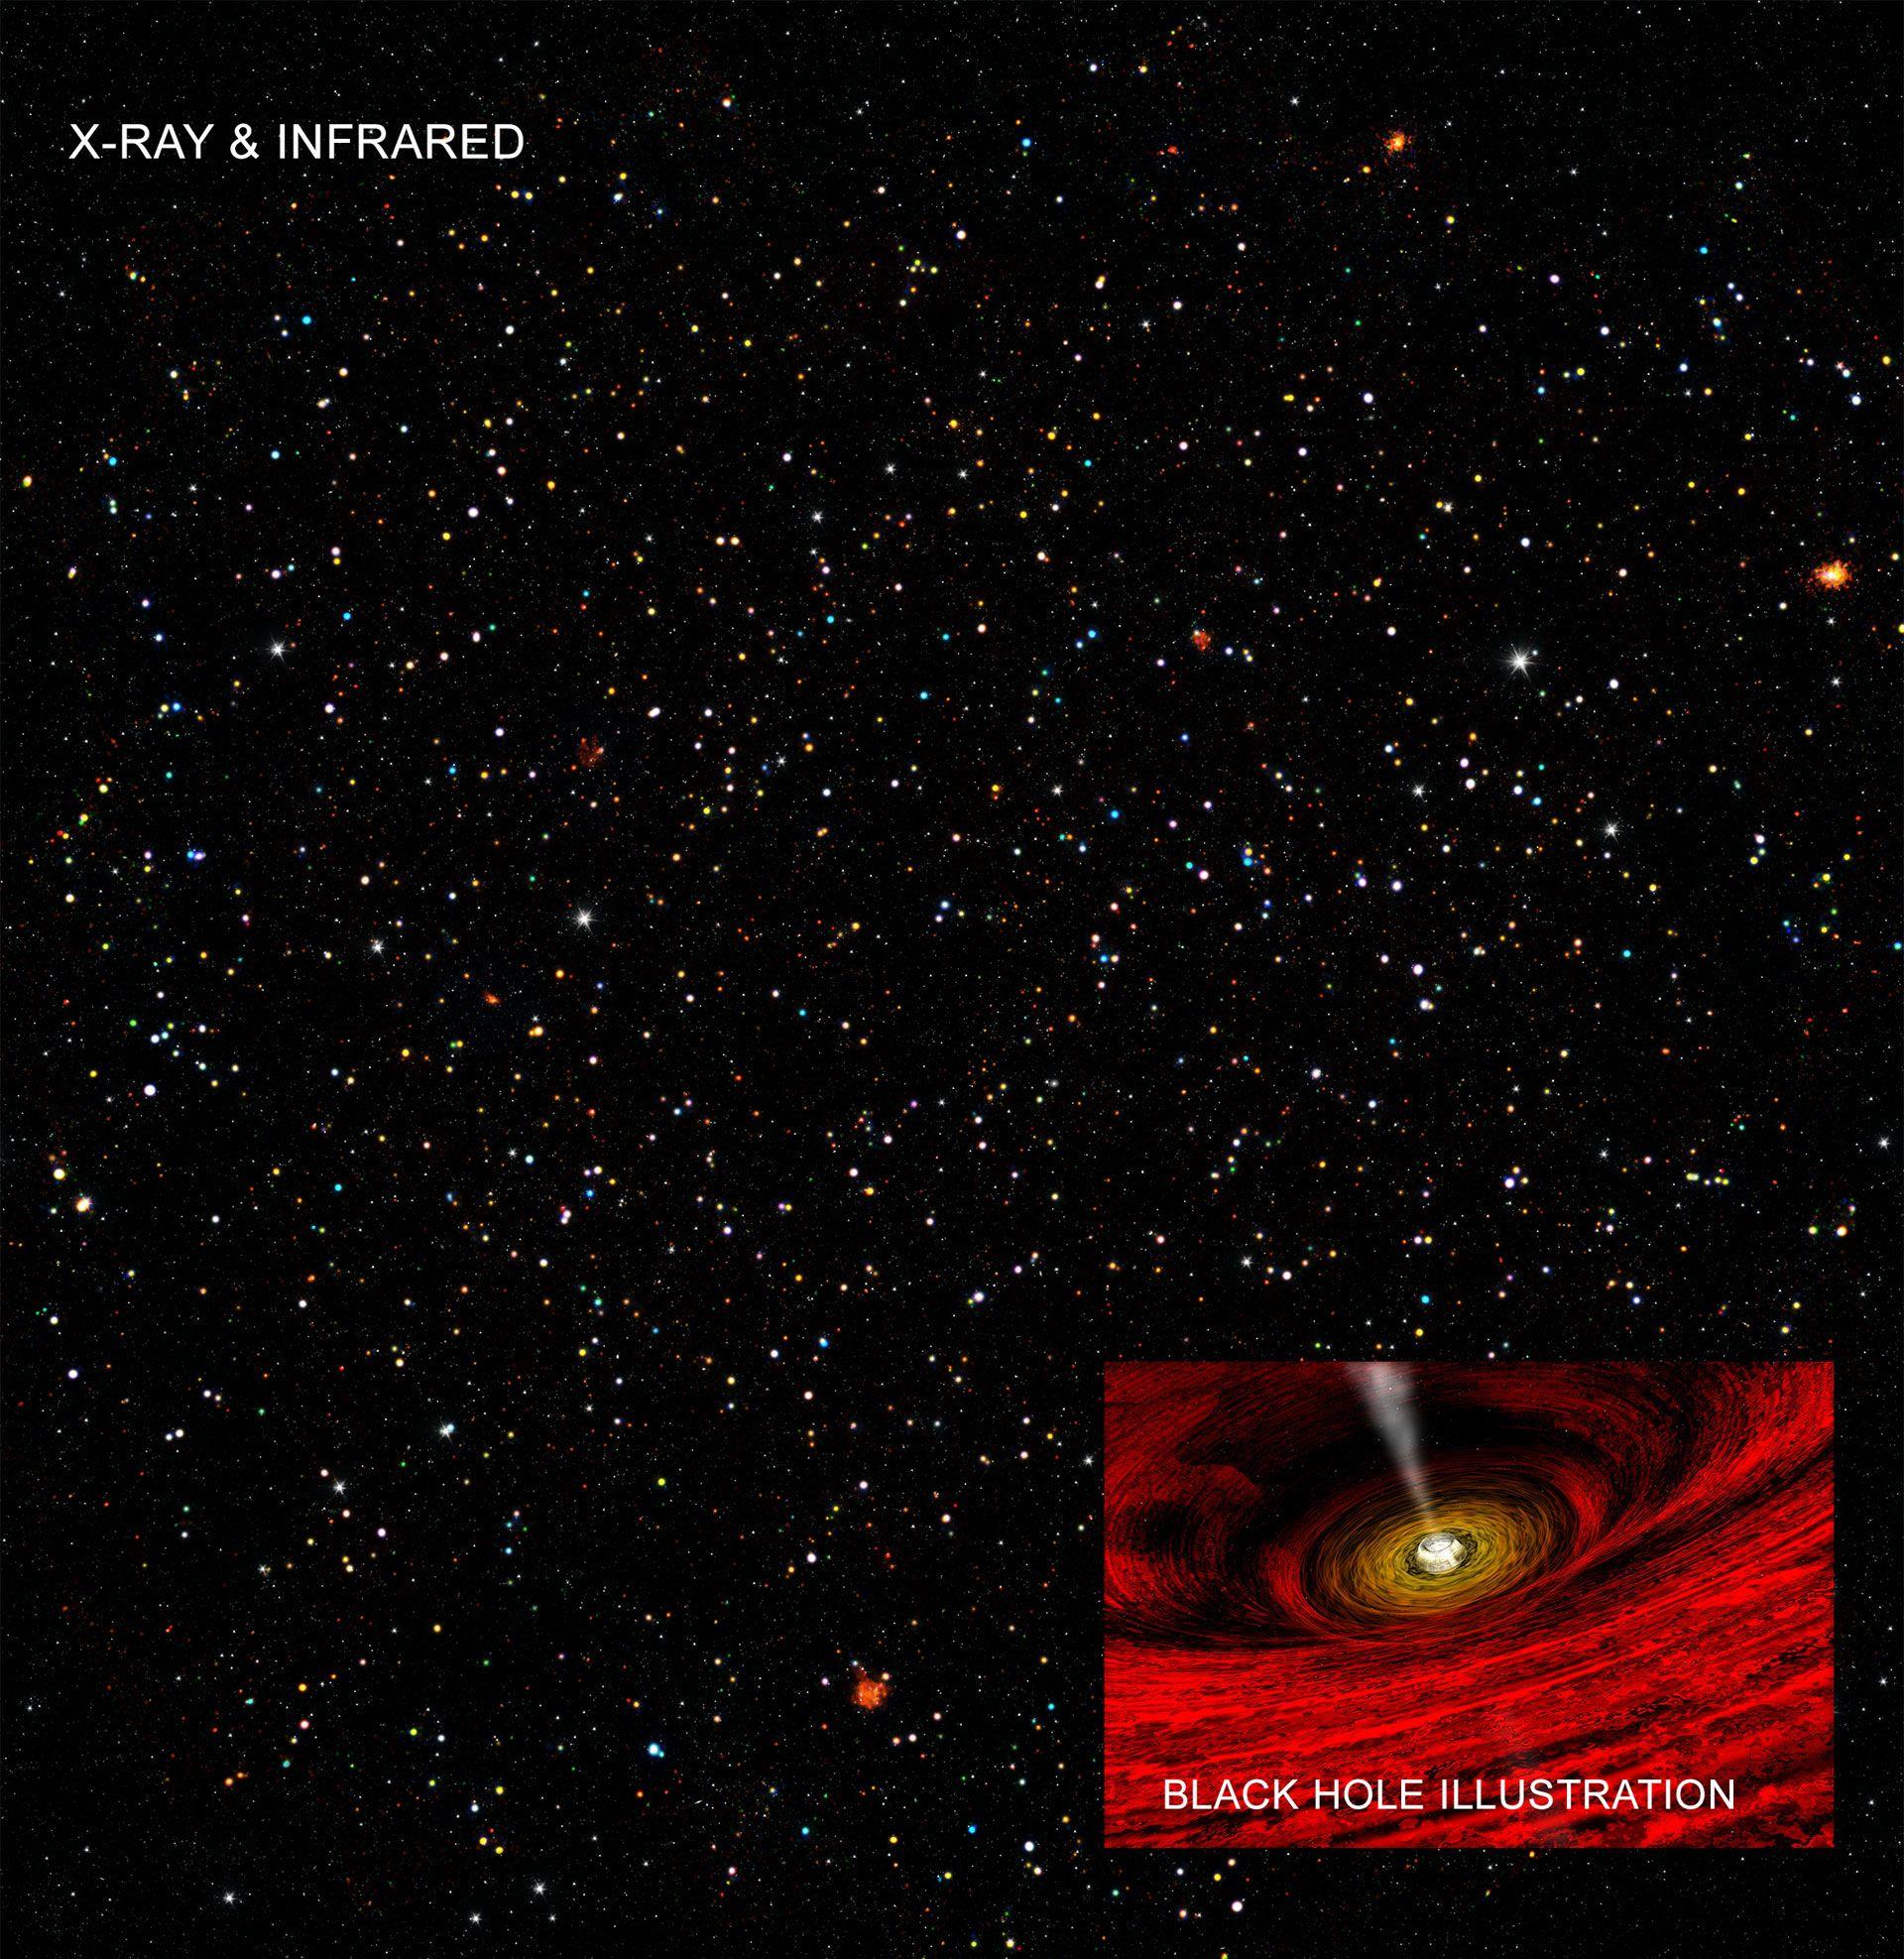 Chandra Reveals Critical Evidence of Elusive Intermediate-Mass Black ...